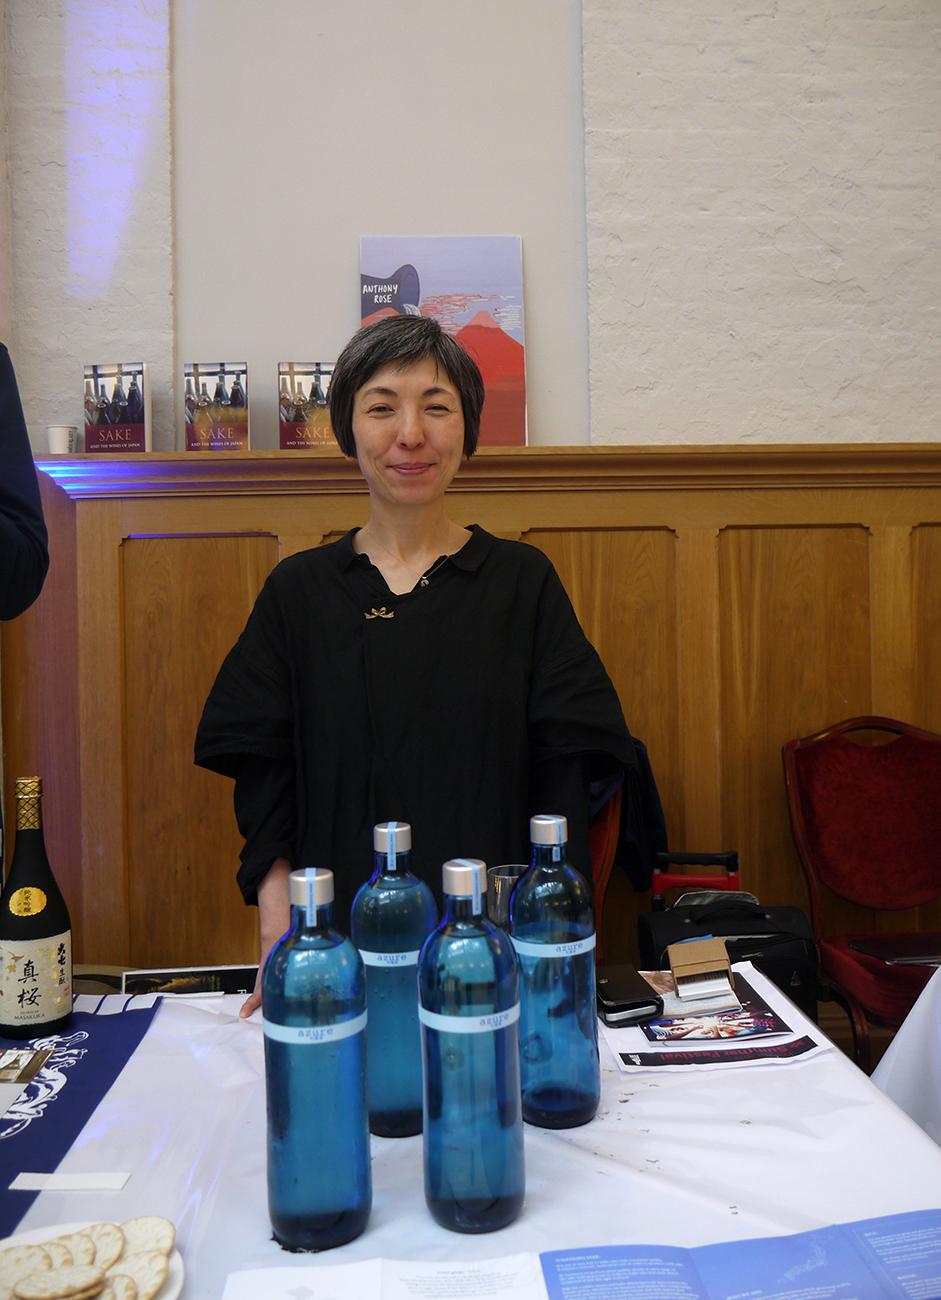 Yukiko Hiromatsu of Tosatsuru brewery with bottles of the iconic Azure